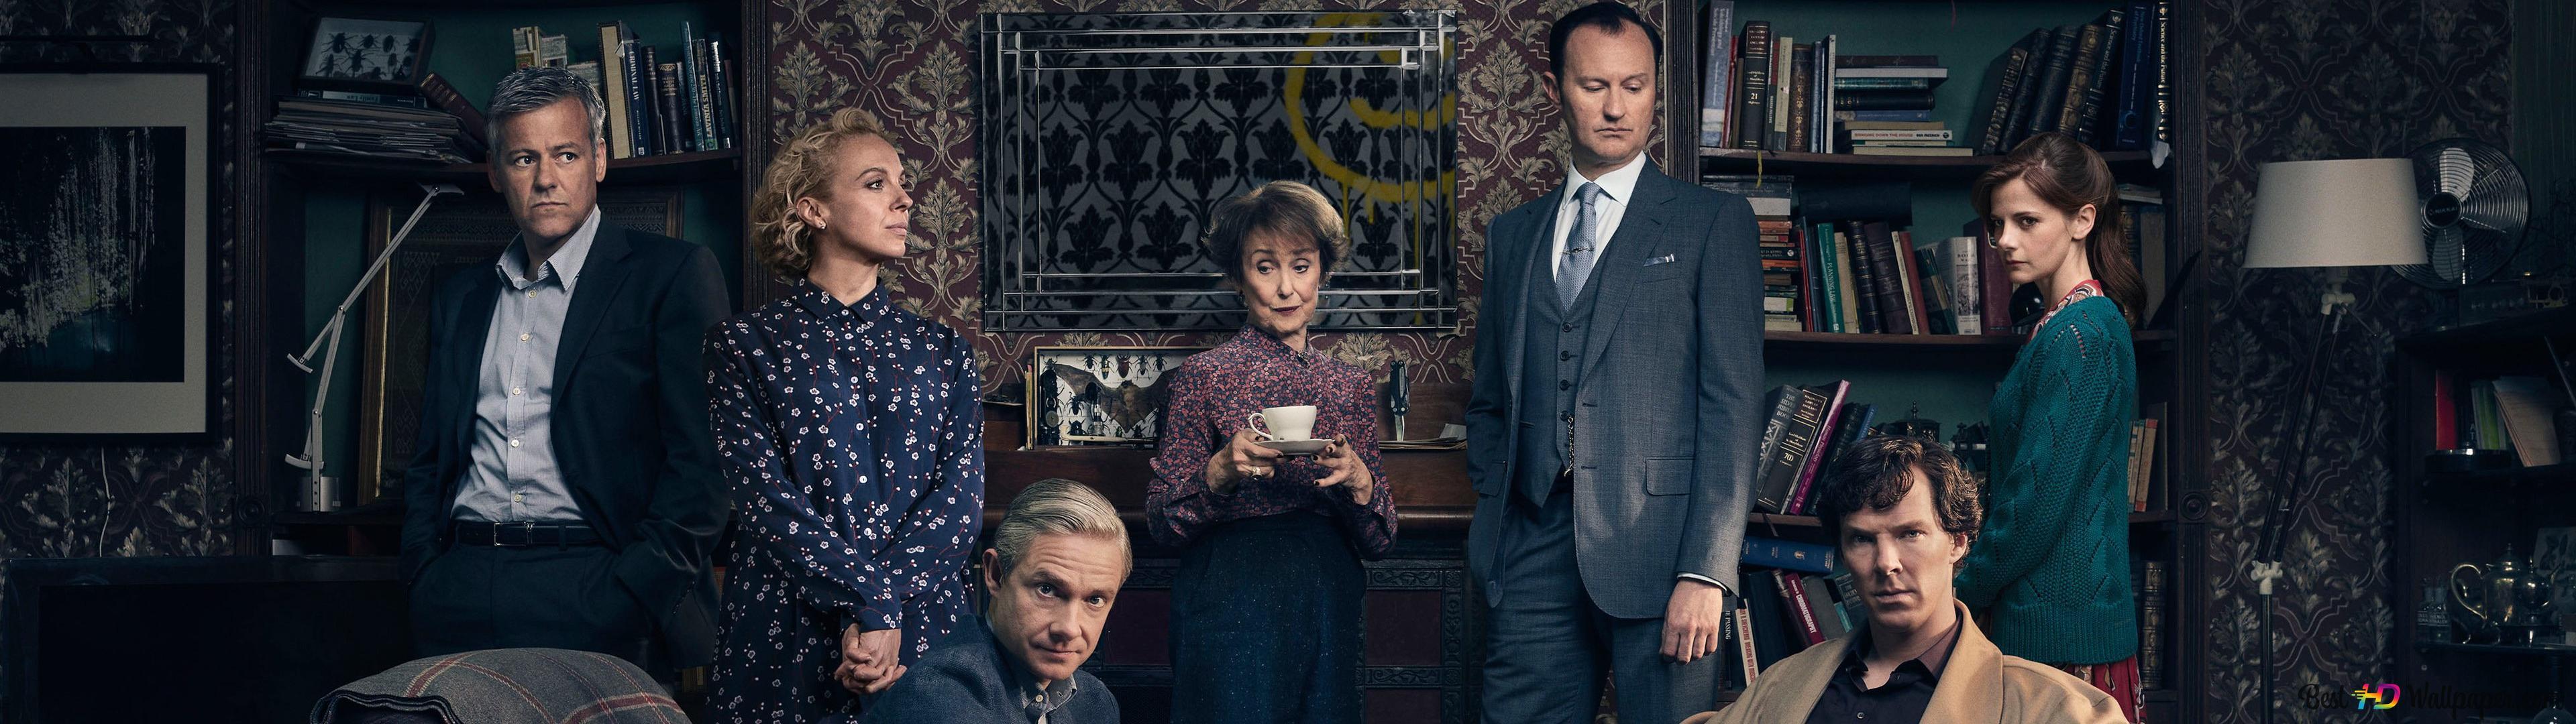 Sherlock Holmes Tv Series HD Wallpaper Download